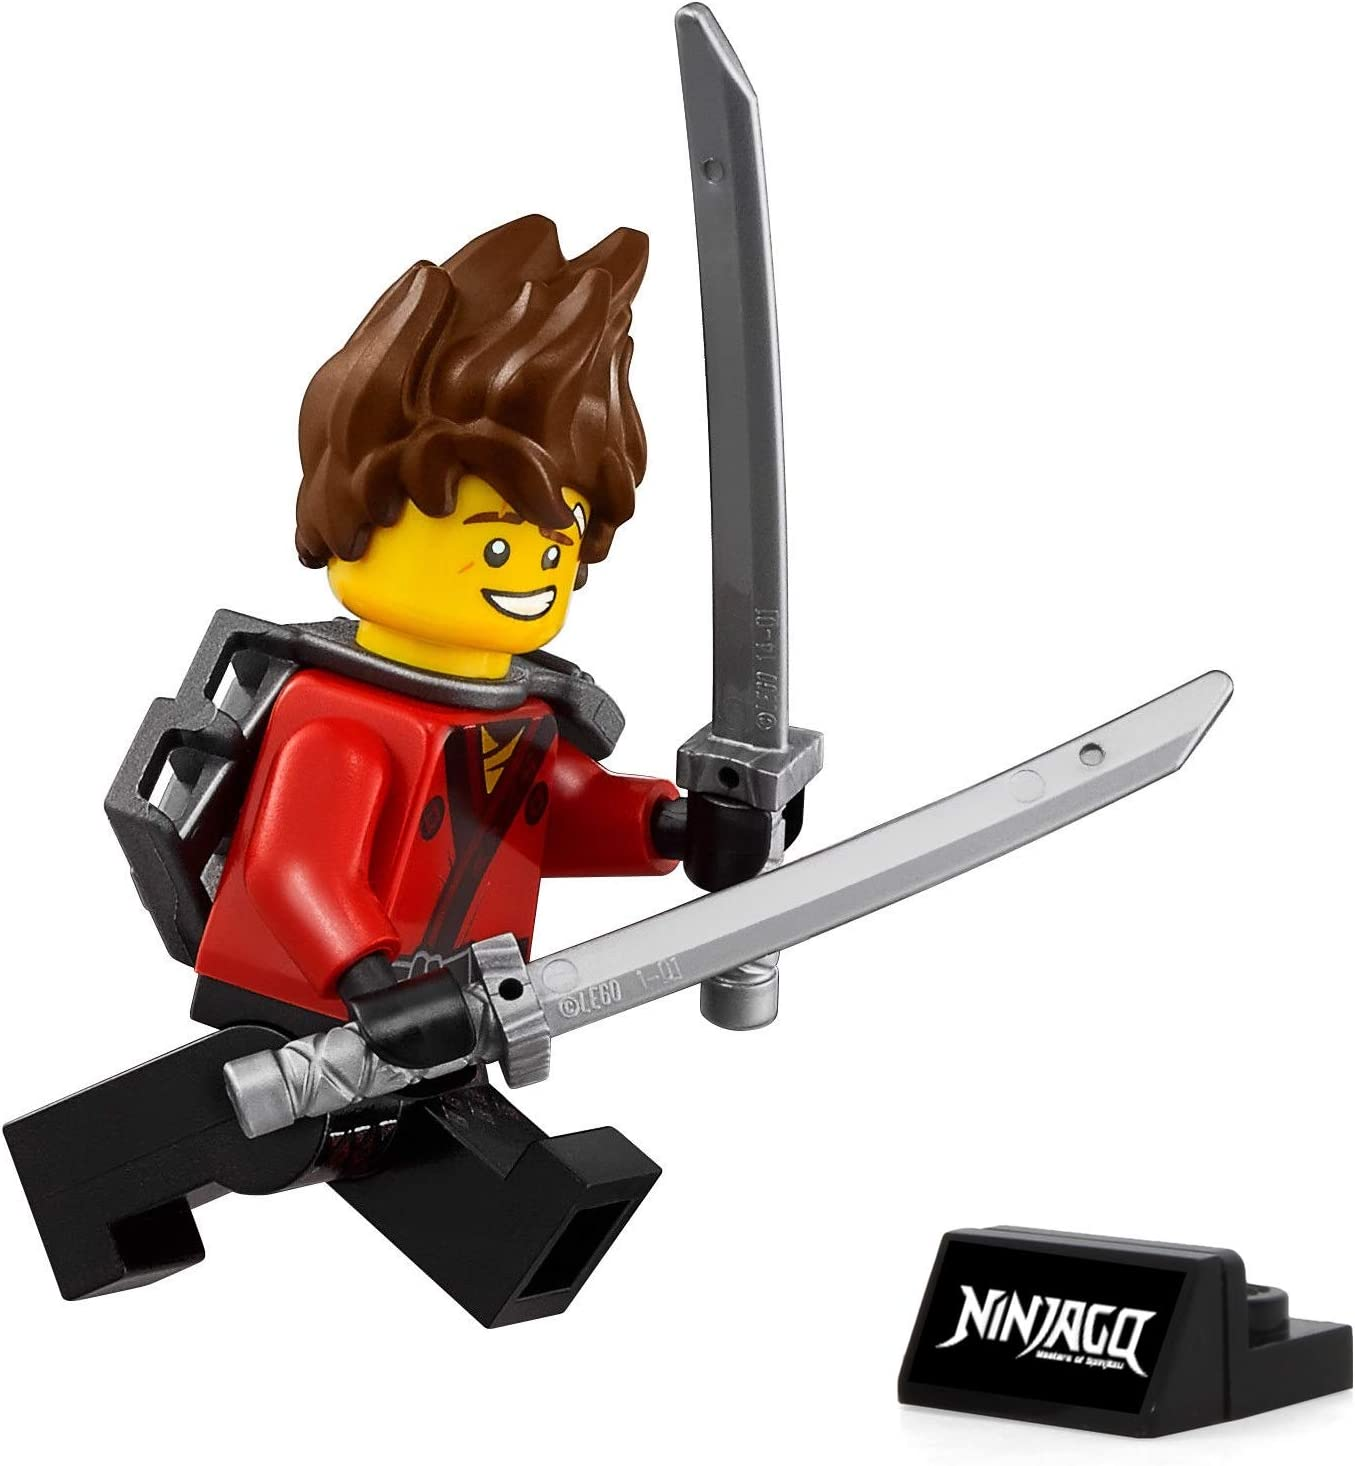 Amazon Com Lego Ninjago Movie Kai Minifigure With Spiked Hair And Display Stand 70629 Toys Games